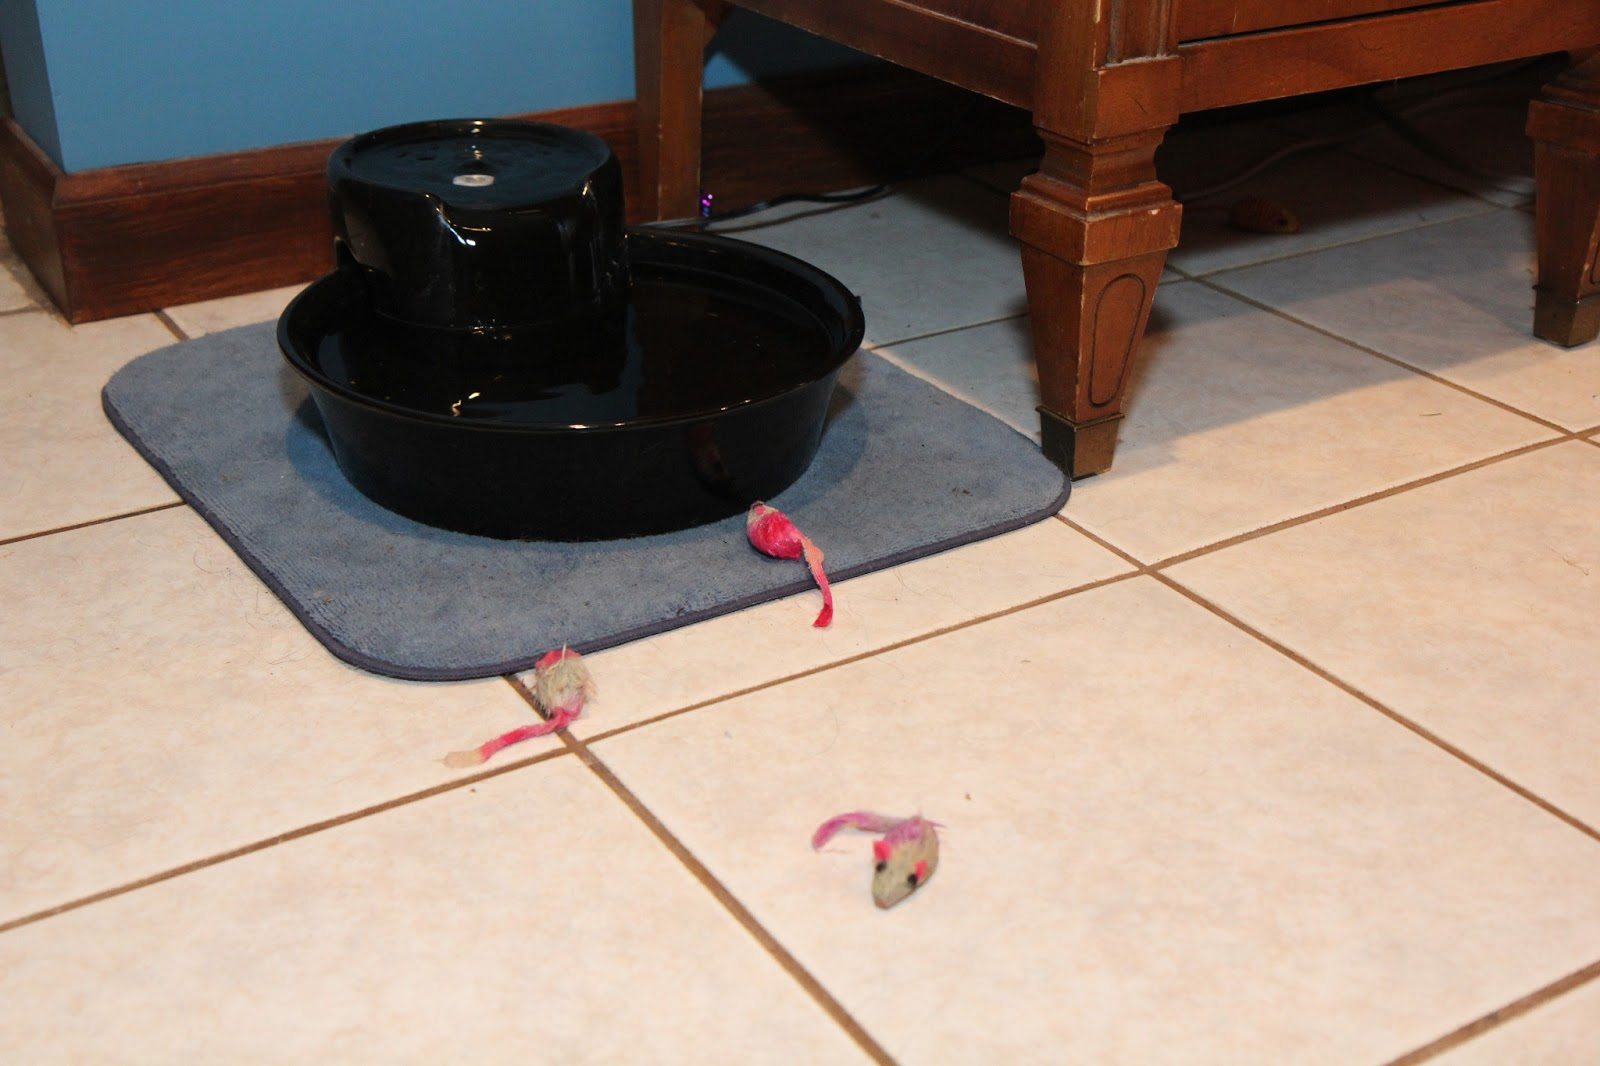 Three wet cat toys